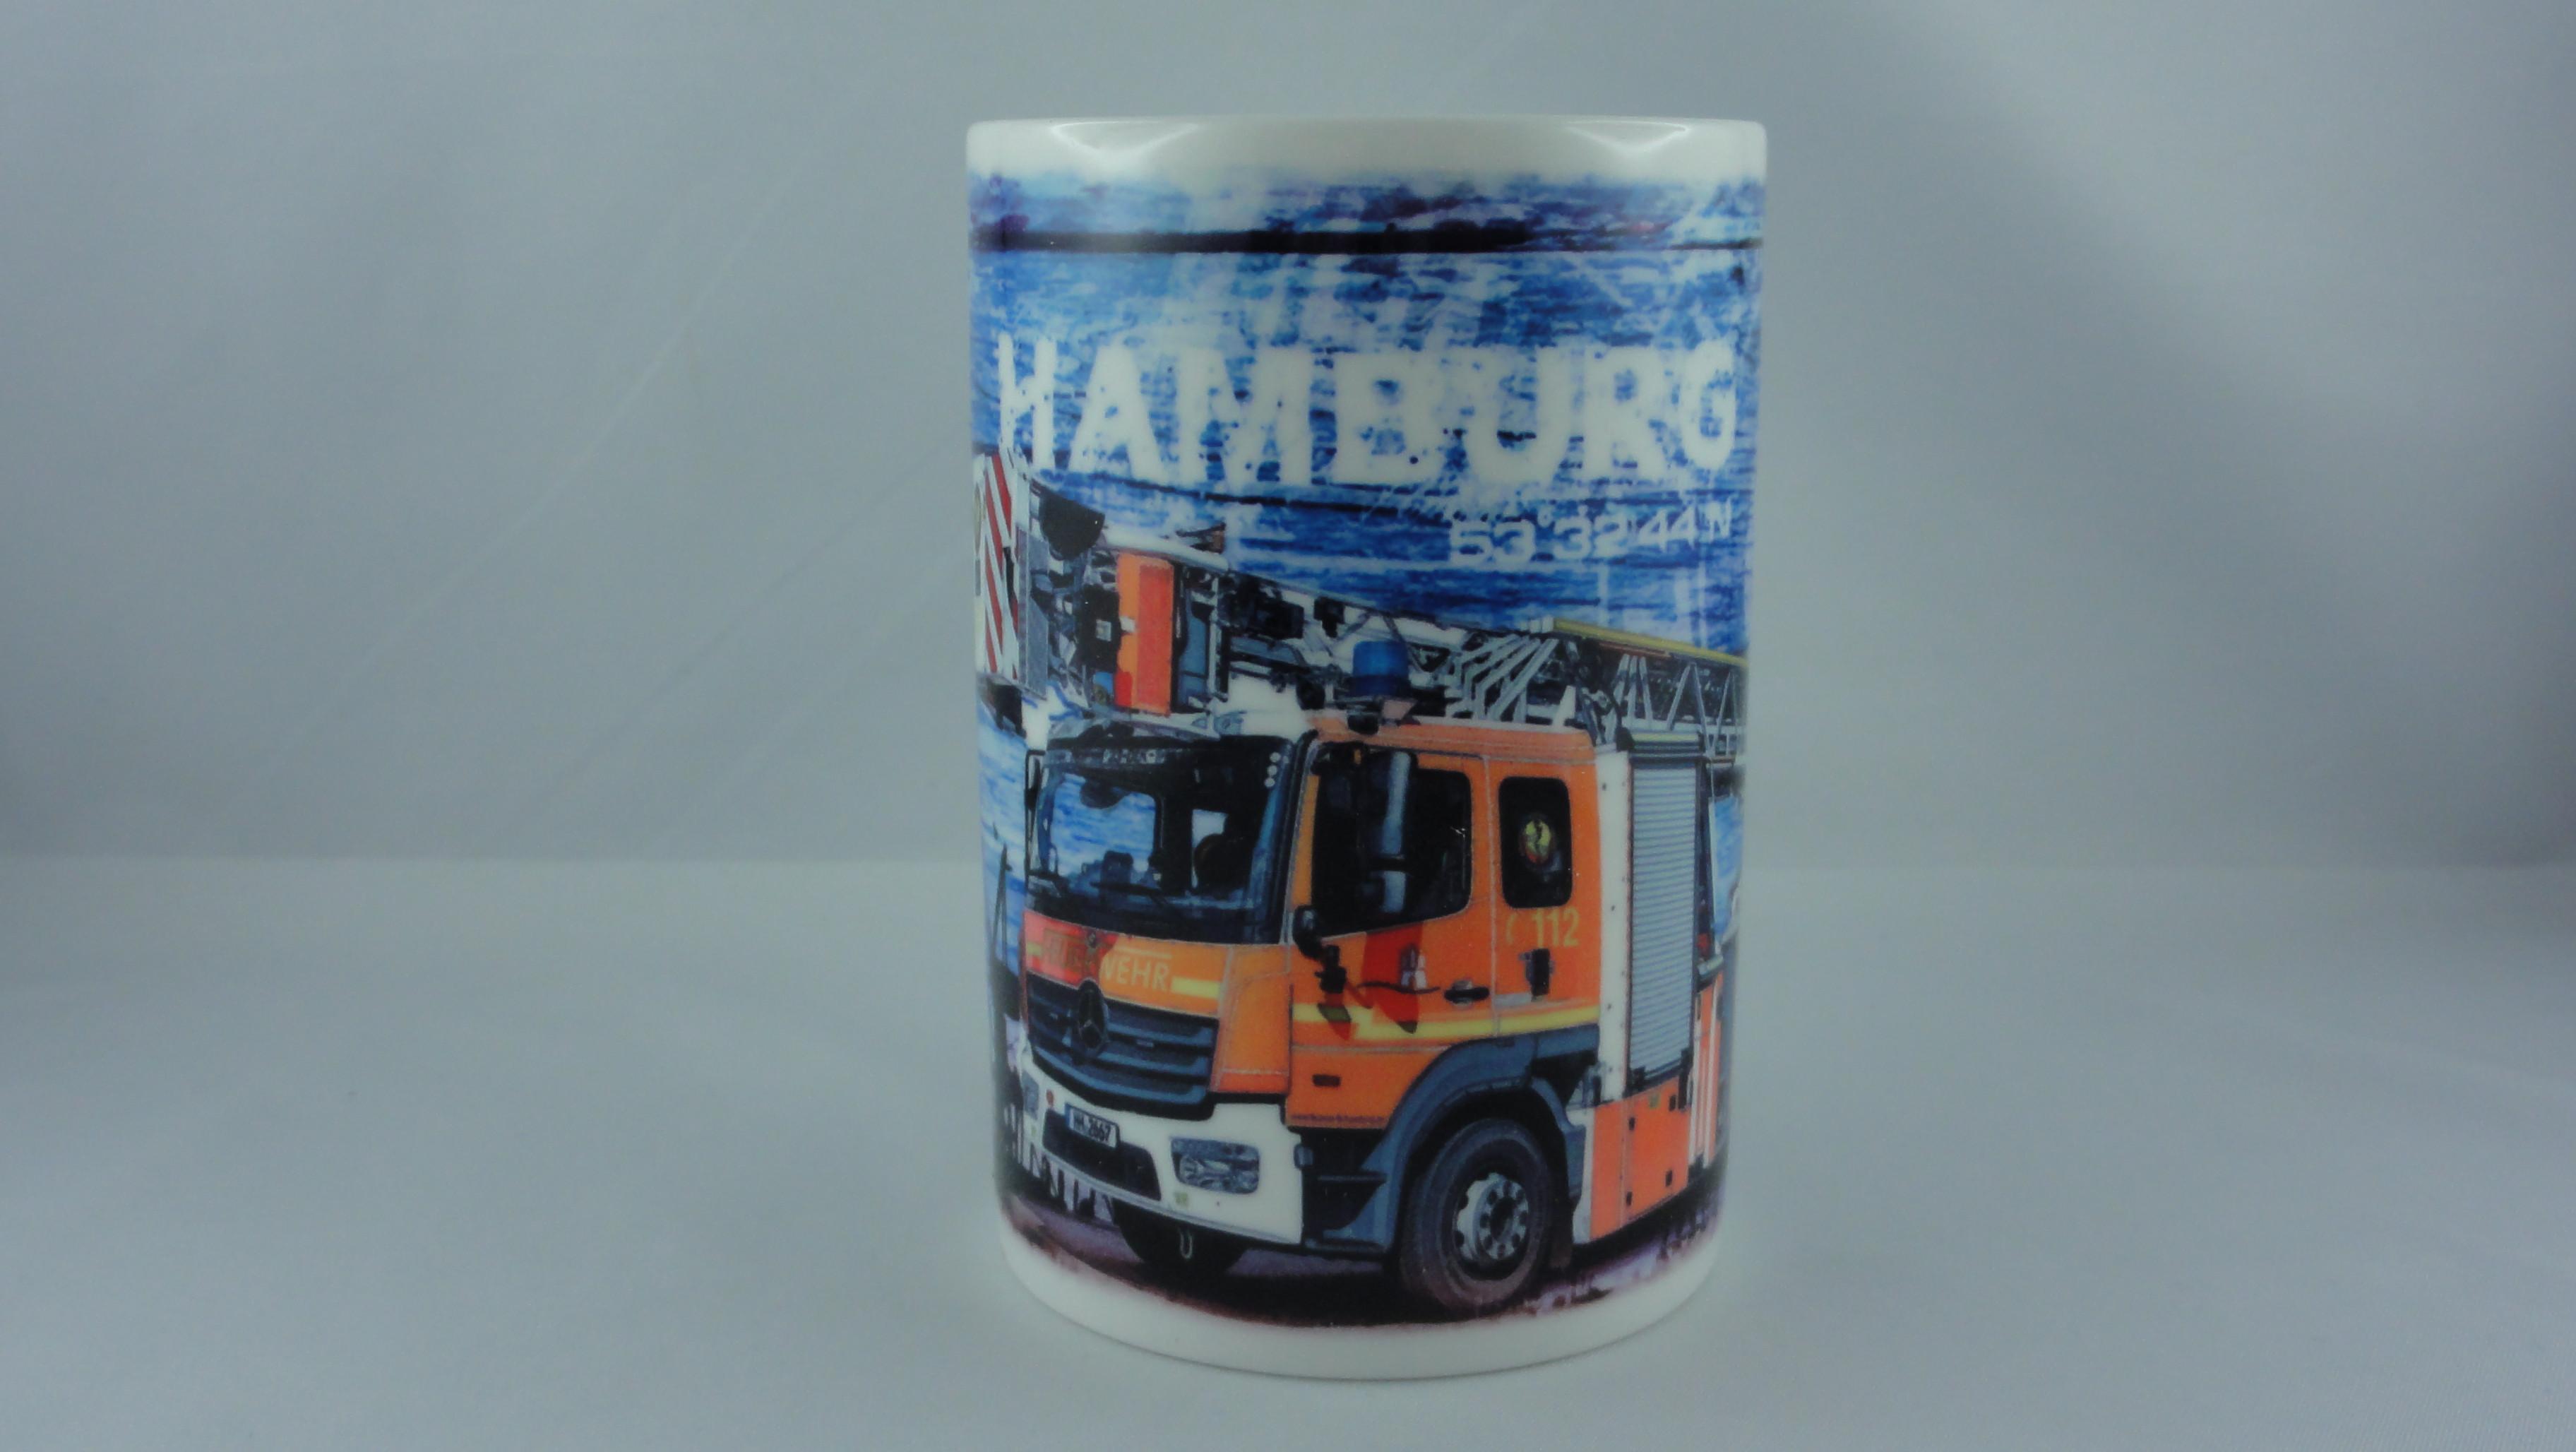 Sammelbecher Motiv DLK L32 BF Hamburg Barmbek, Copyright /Design exclusiv by günterblockfotografie